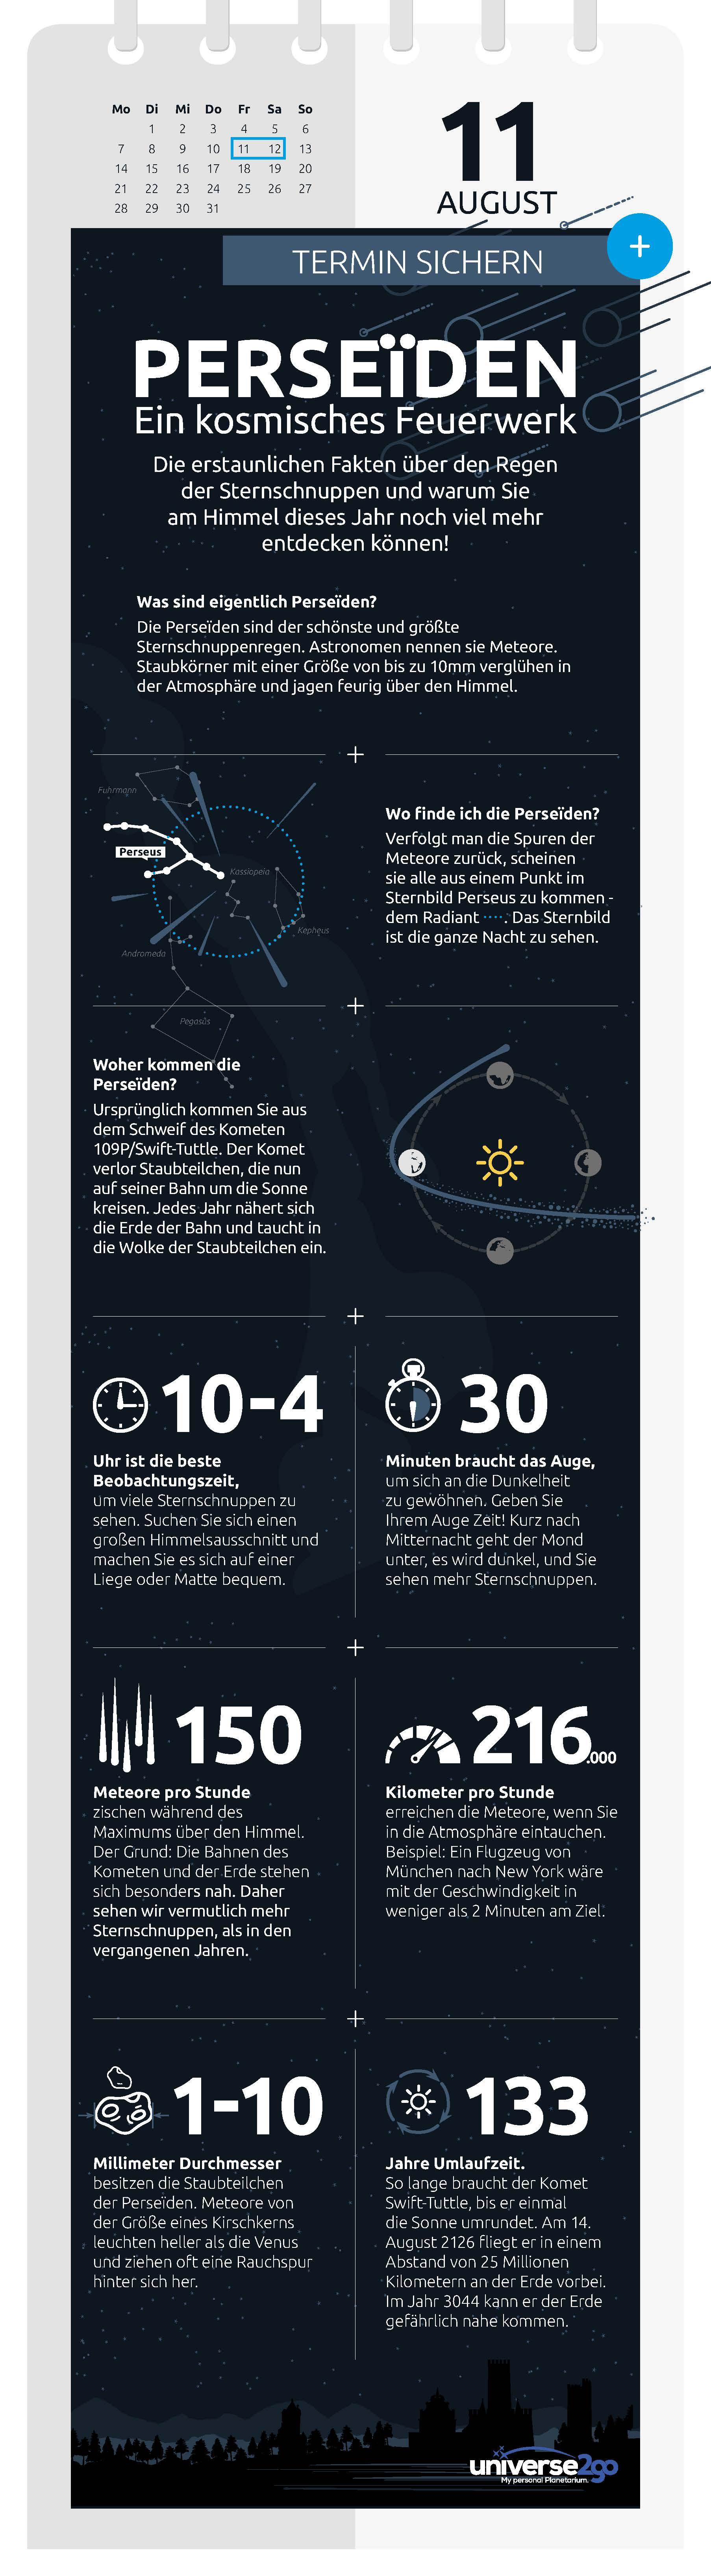 Infografik Perseiden 2017